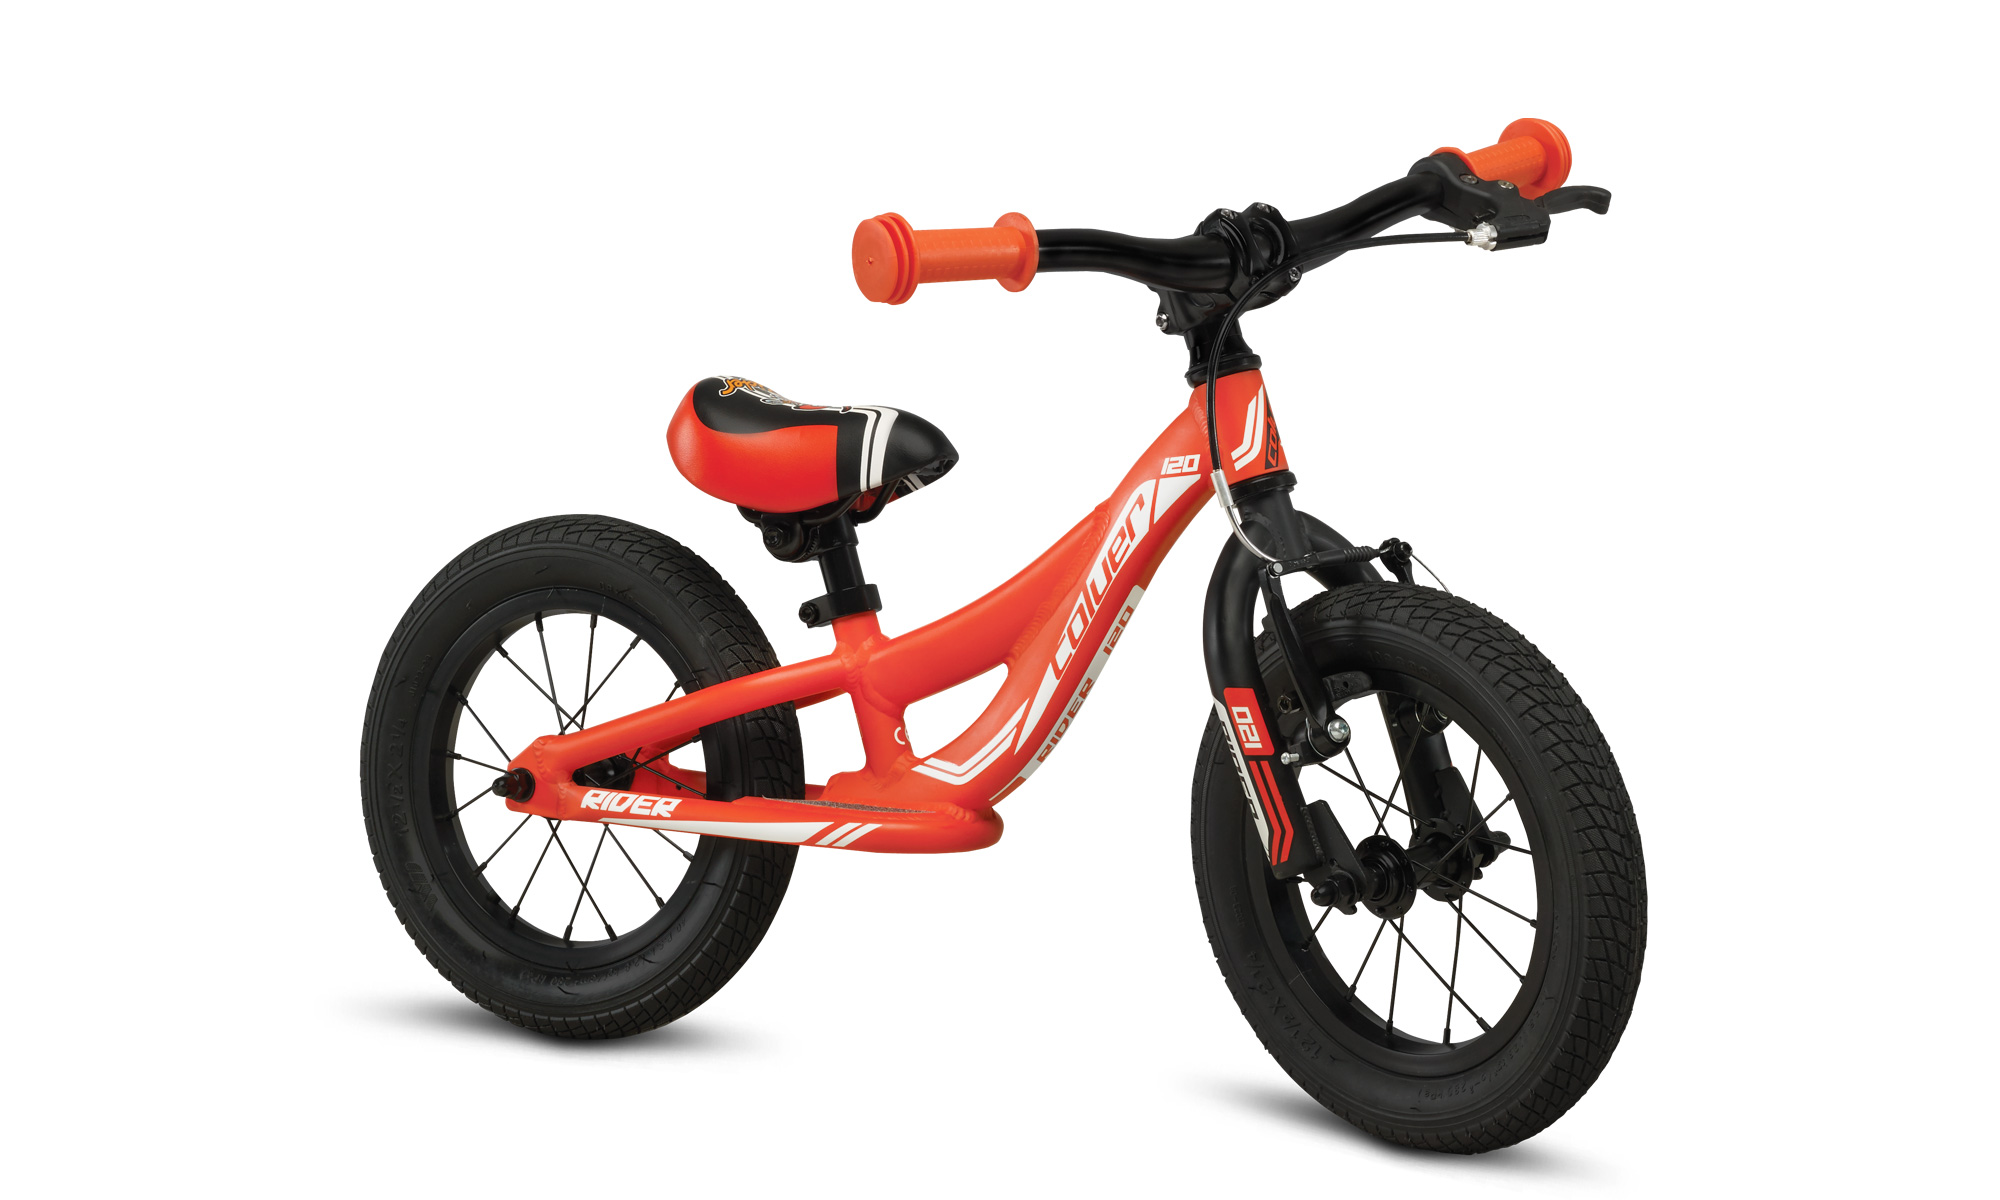 Bicicleta Infantil 12 Coluer Rider 120 sin pedales   Ciclomania